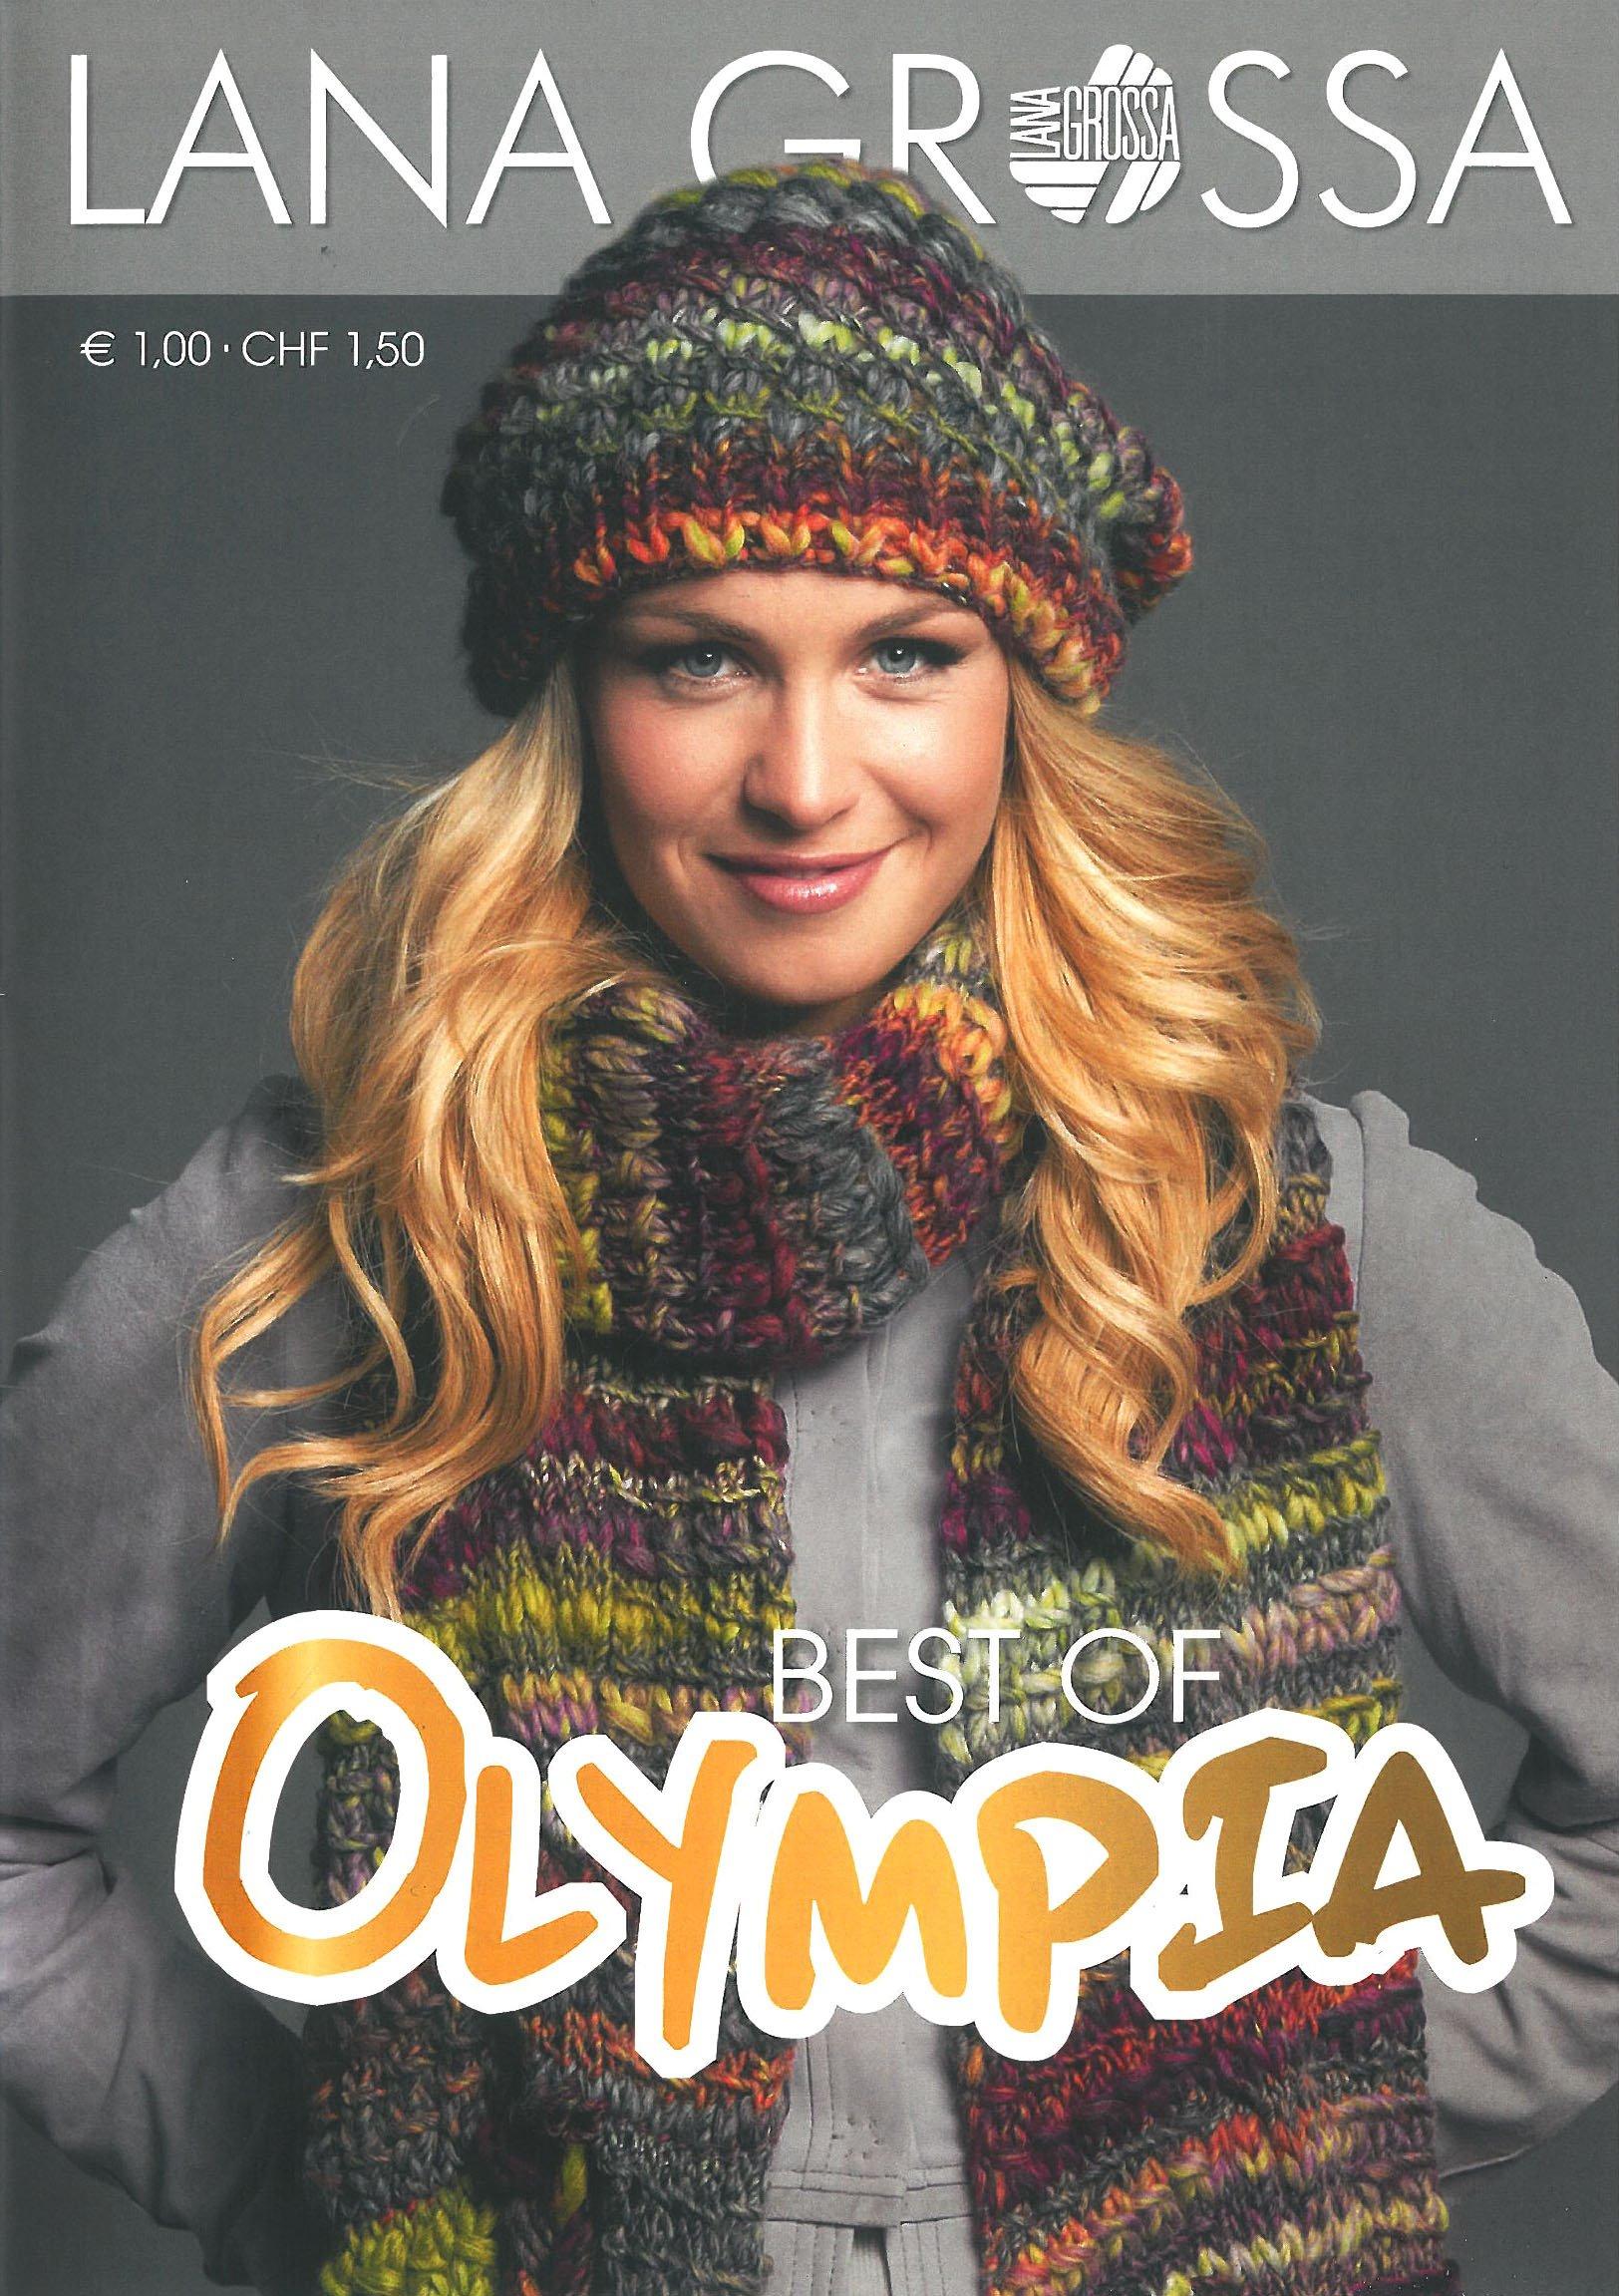 Lana Grossa OLYMPIA Folder - BEST OF OLYMPIA (Magdalena Neuner)